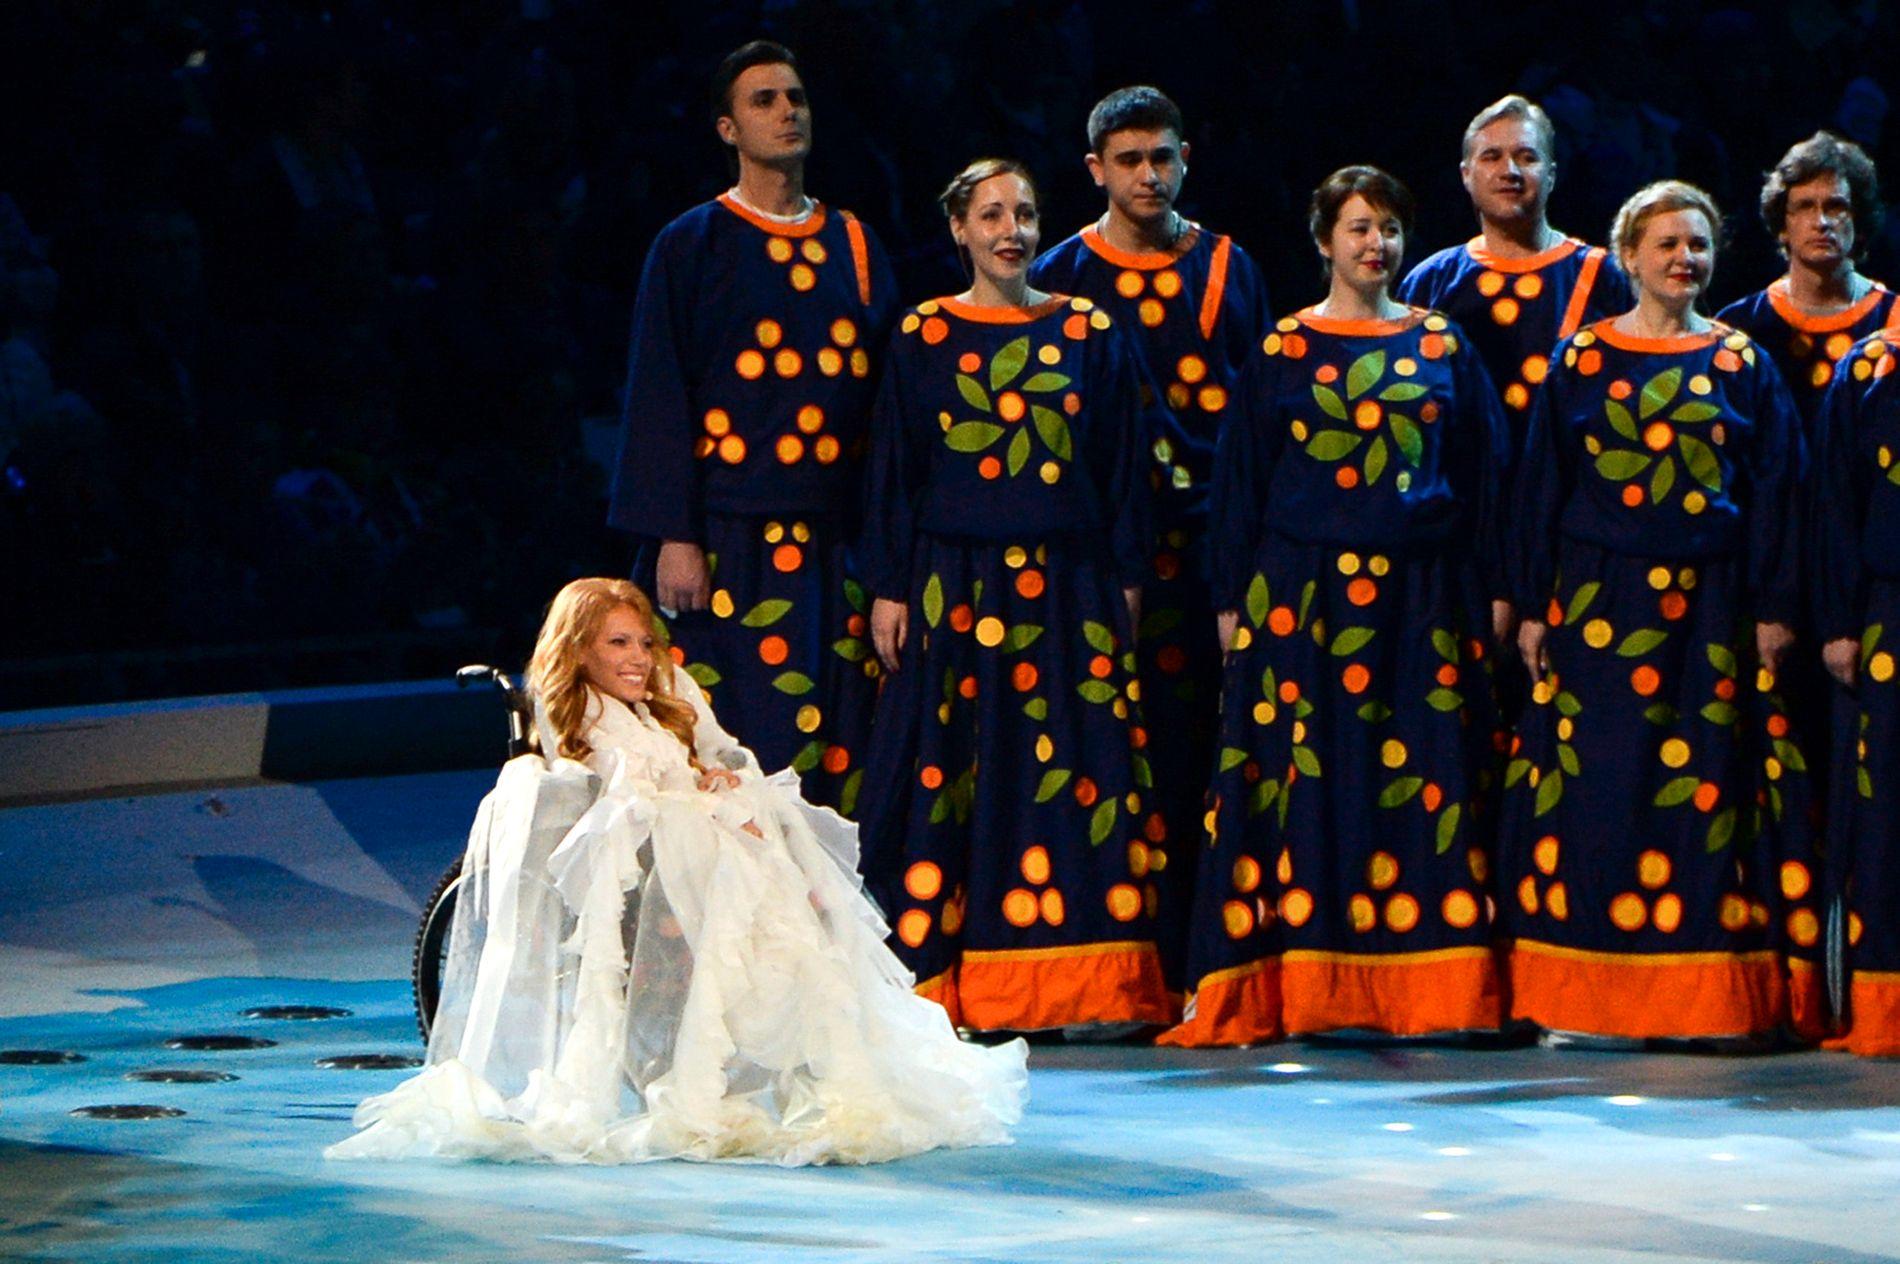 STRID: Den europeiske kringkastingsunionen (EBU) vil la Julija Samojlova (27) opptre på den internasjonale Grand Prix-finalen via satellitt - men Russland nekter. Foto: AP Photo/Ekaterina Lyzlova, File